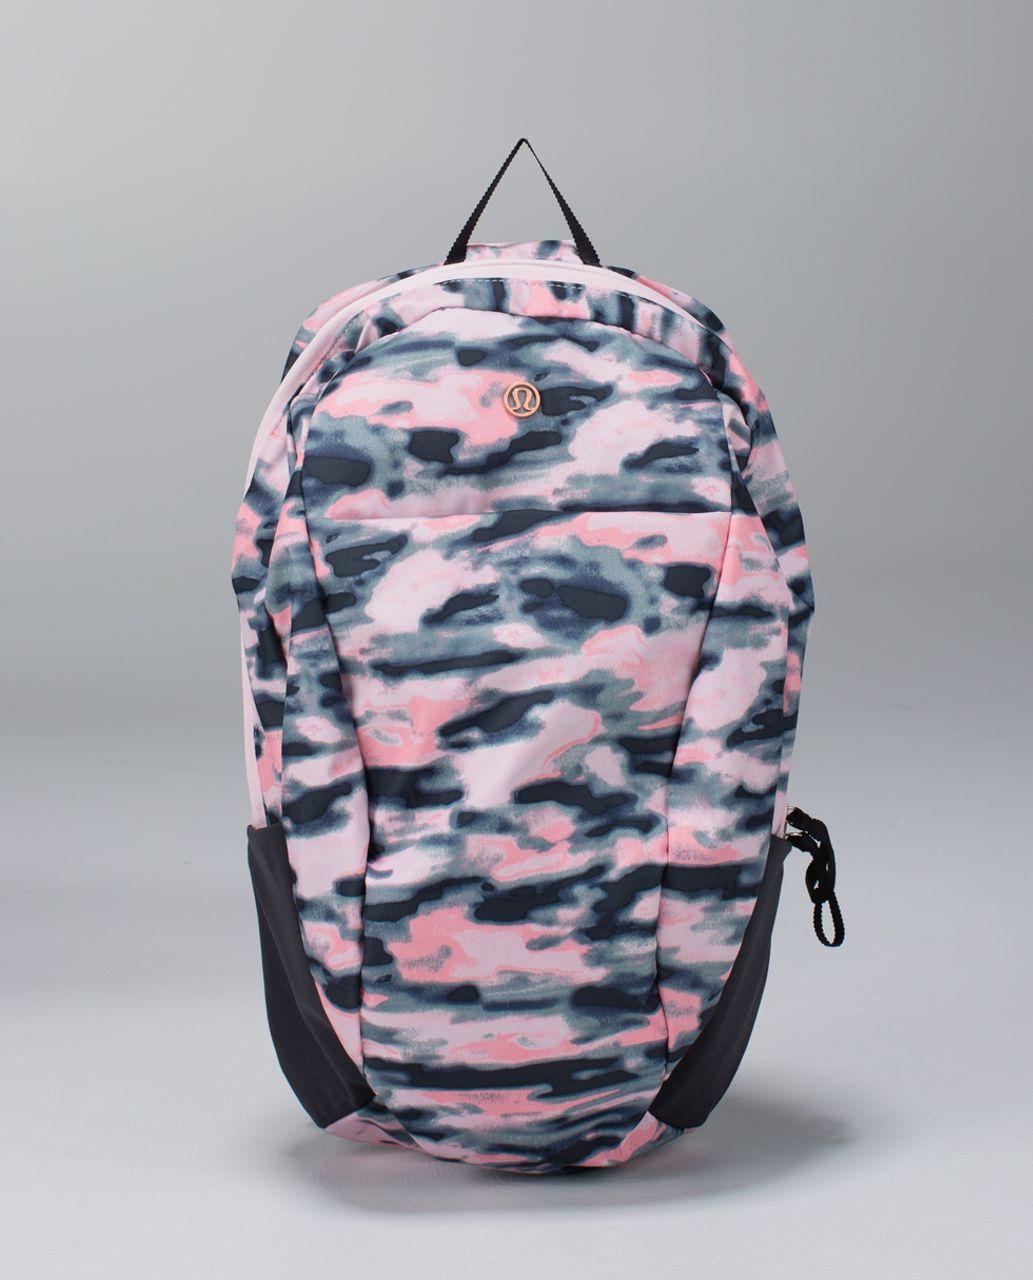 Lululemon Run From Work Backpack - Wamo Camo Barely Pink / Deep Coal